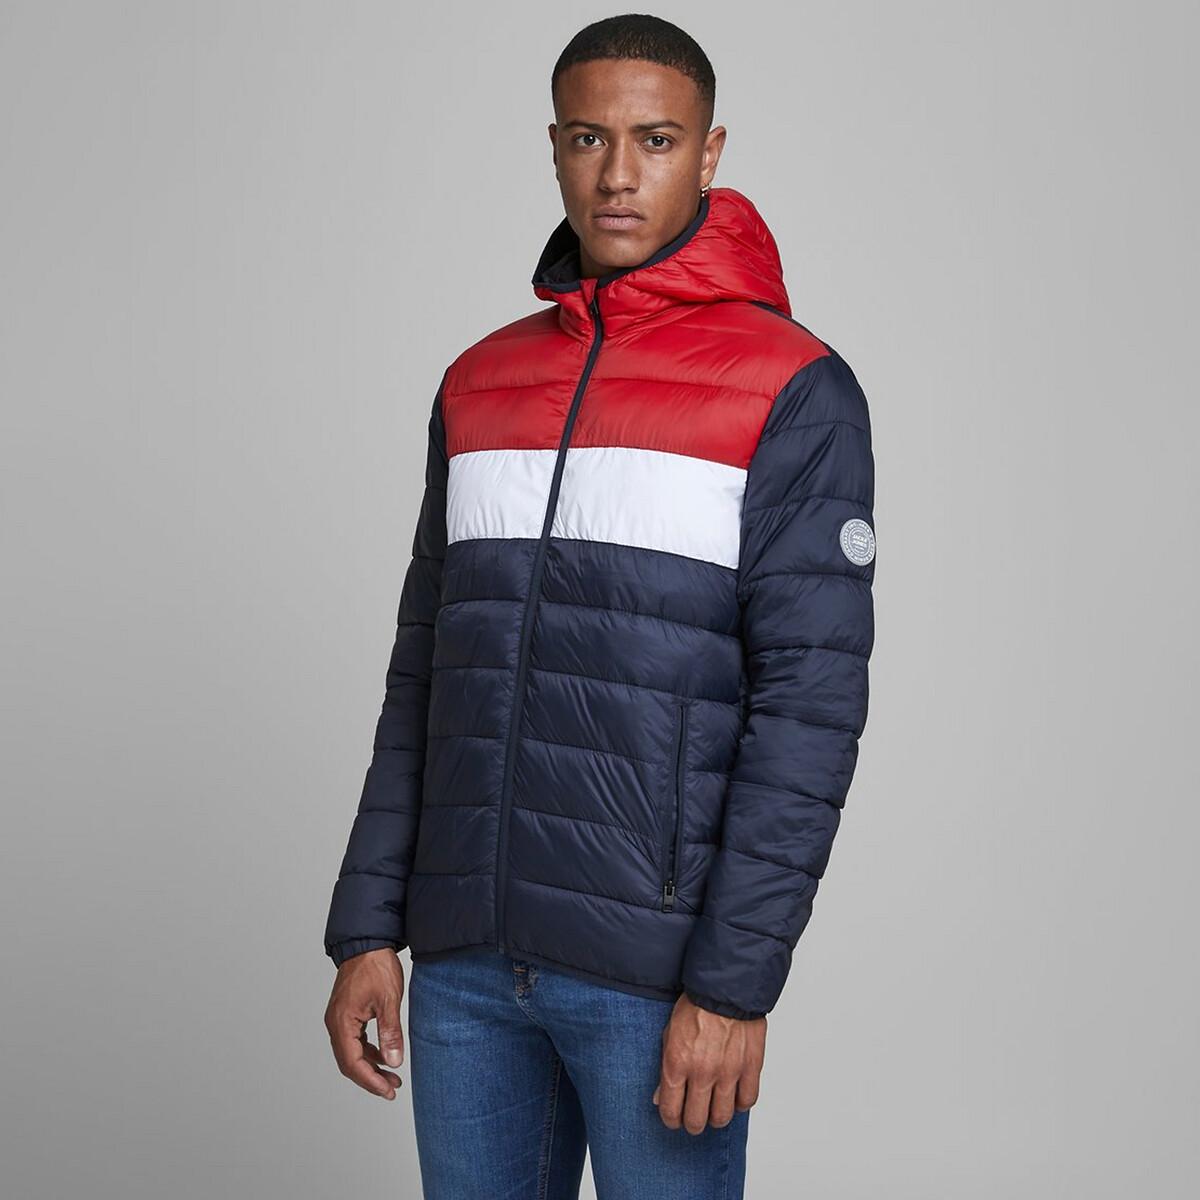 Куртка LaRedoute Стеганая легкая с капюшоном Magic S синий куртка la redoute стеганая на молнии с капюшоном idaho 2 3xl синий